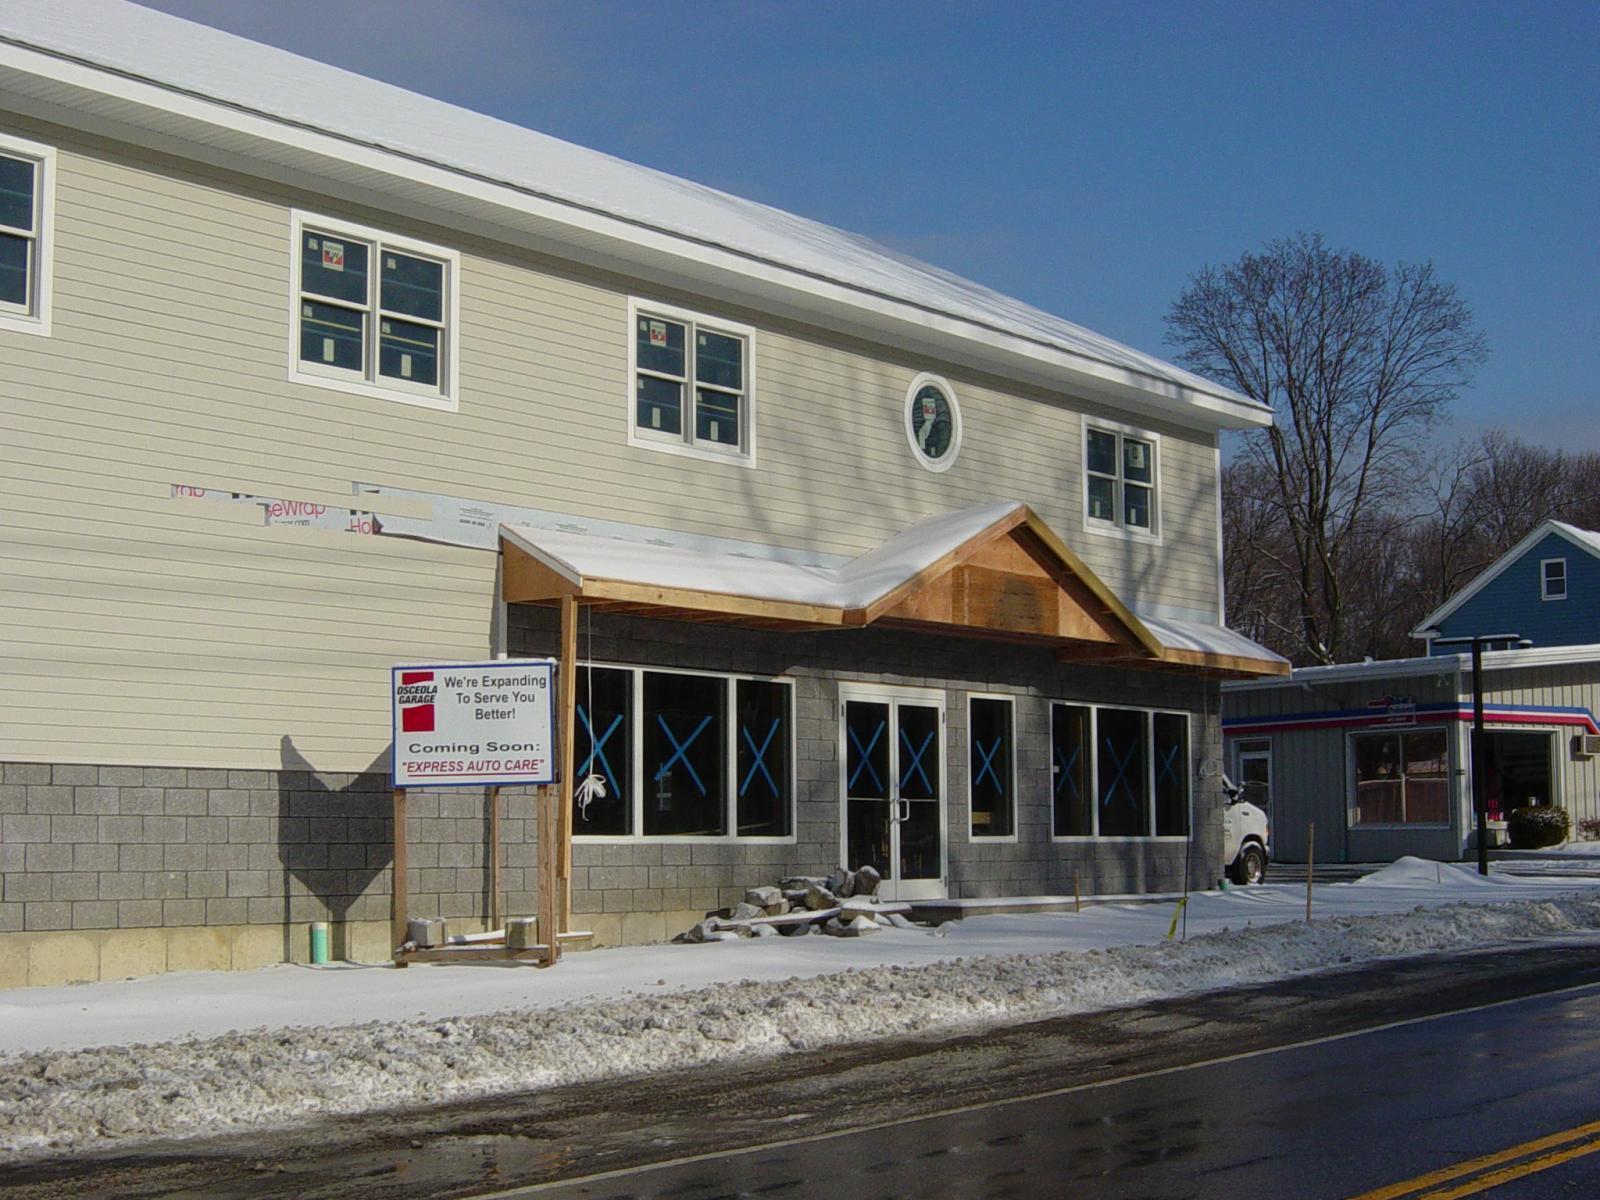 Osceola Shop Expansion 14